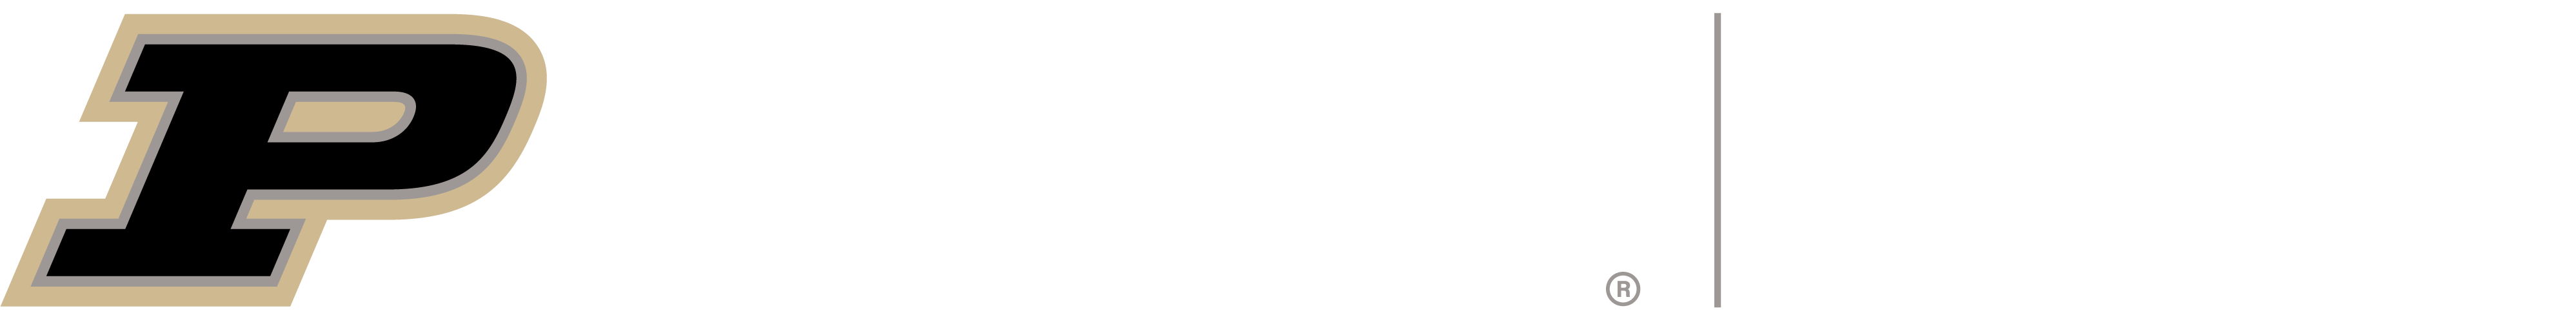 Purdue Polytechnic